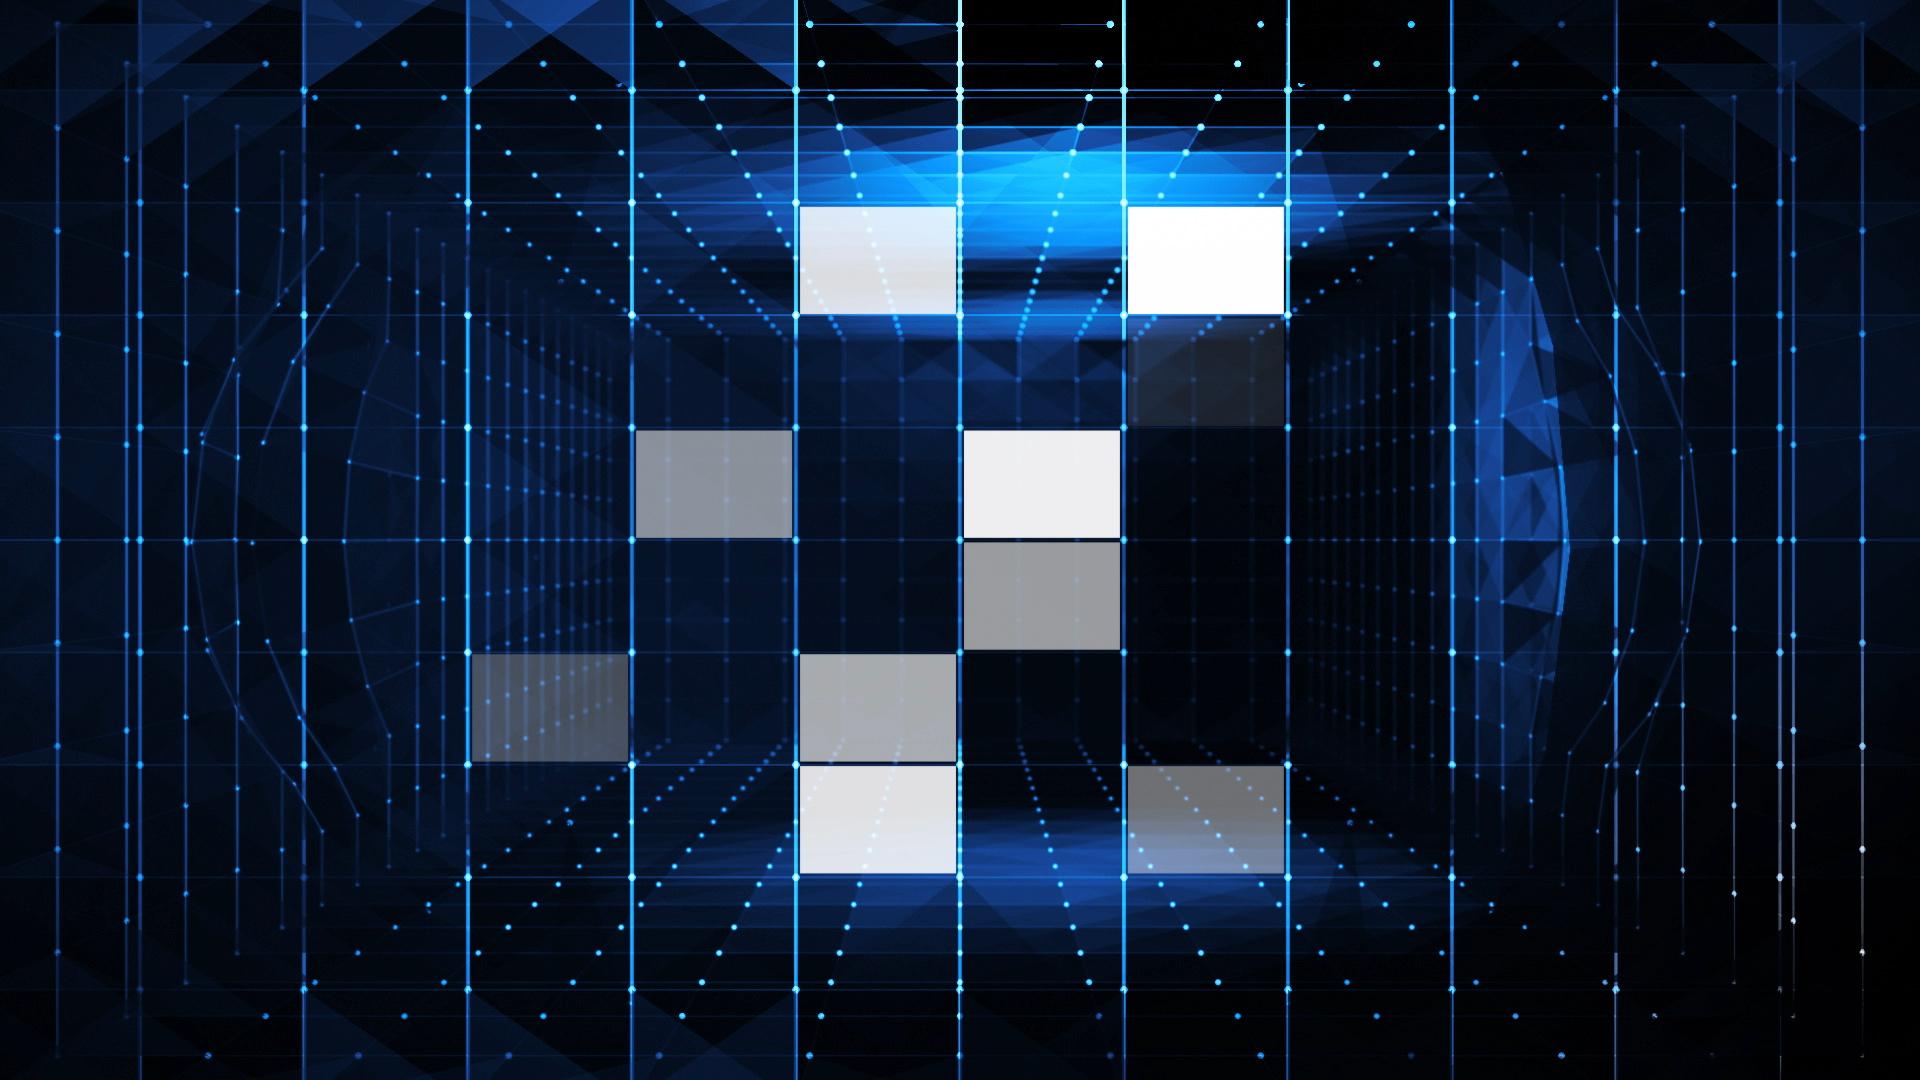 VJ Grid Room